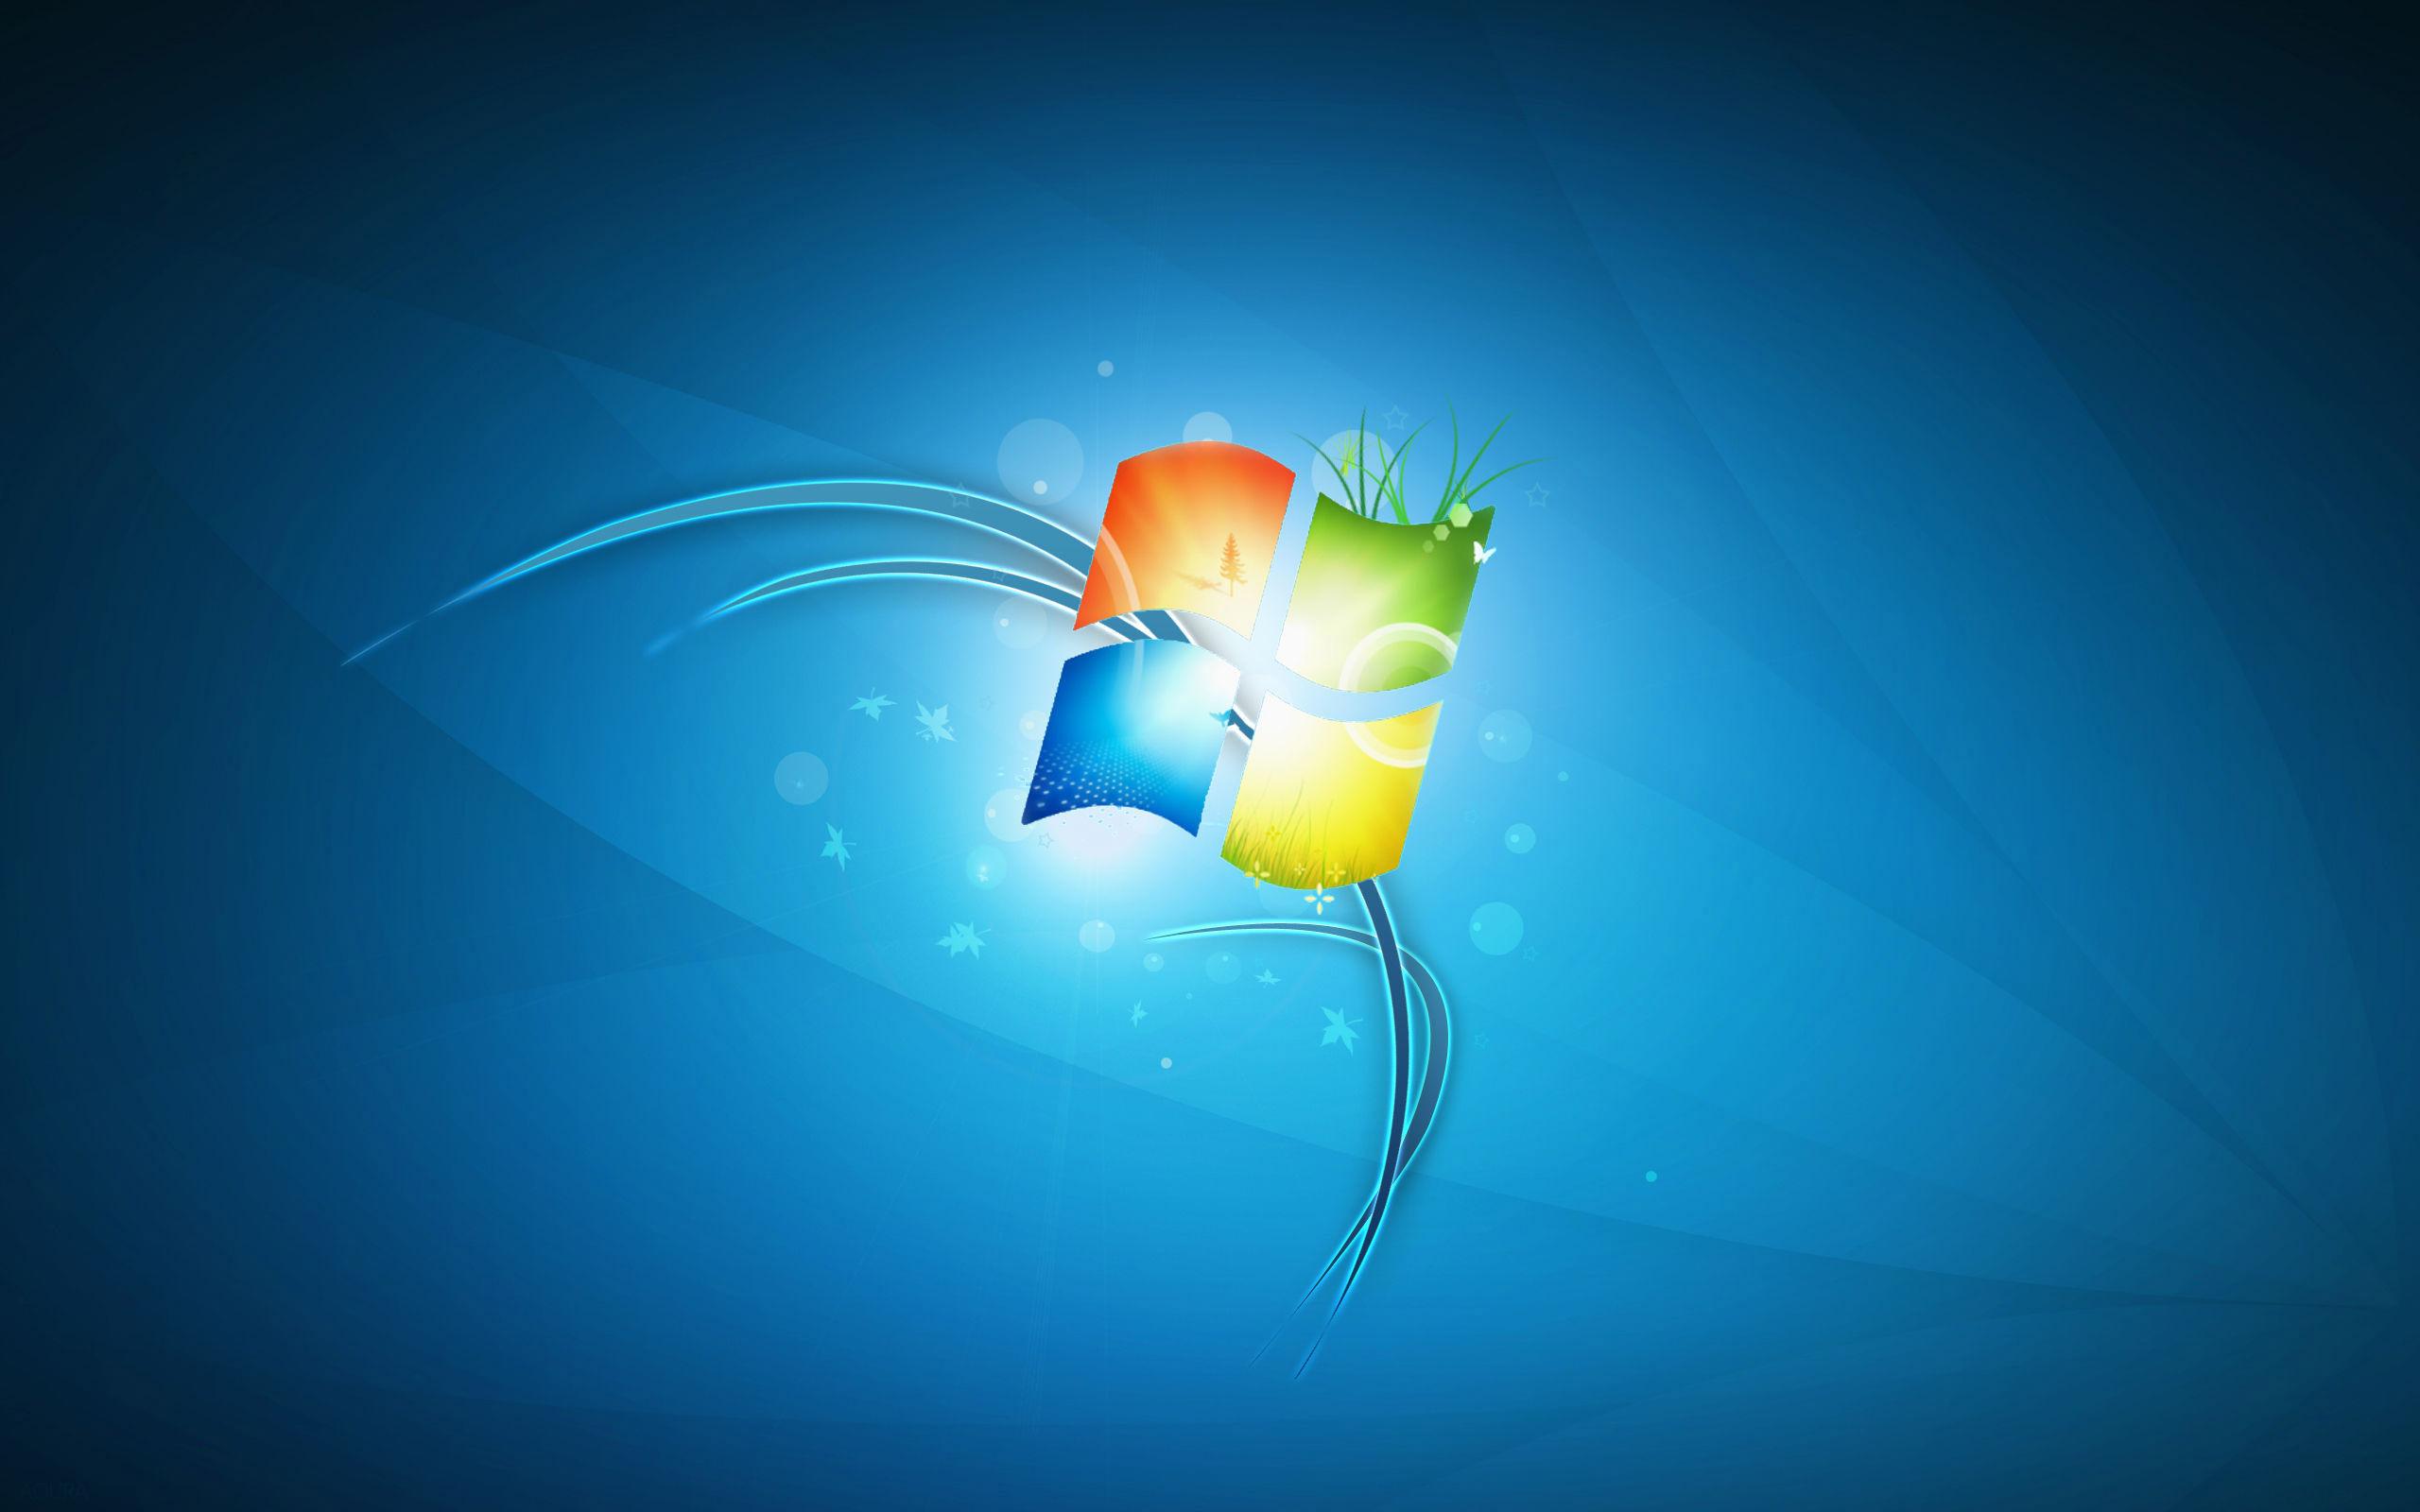 Fond Decran Windows 7 Hd